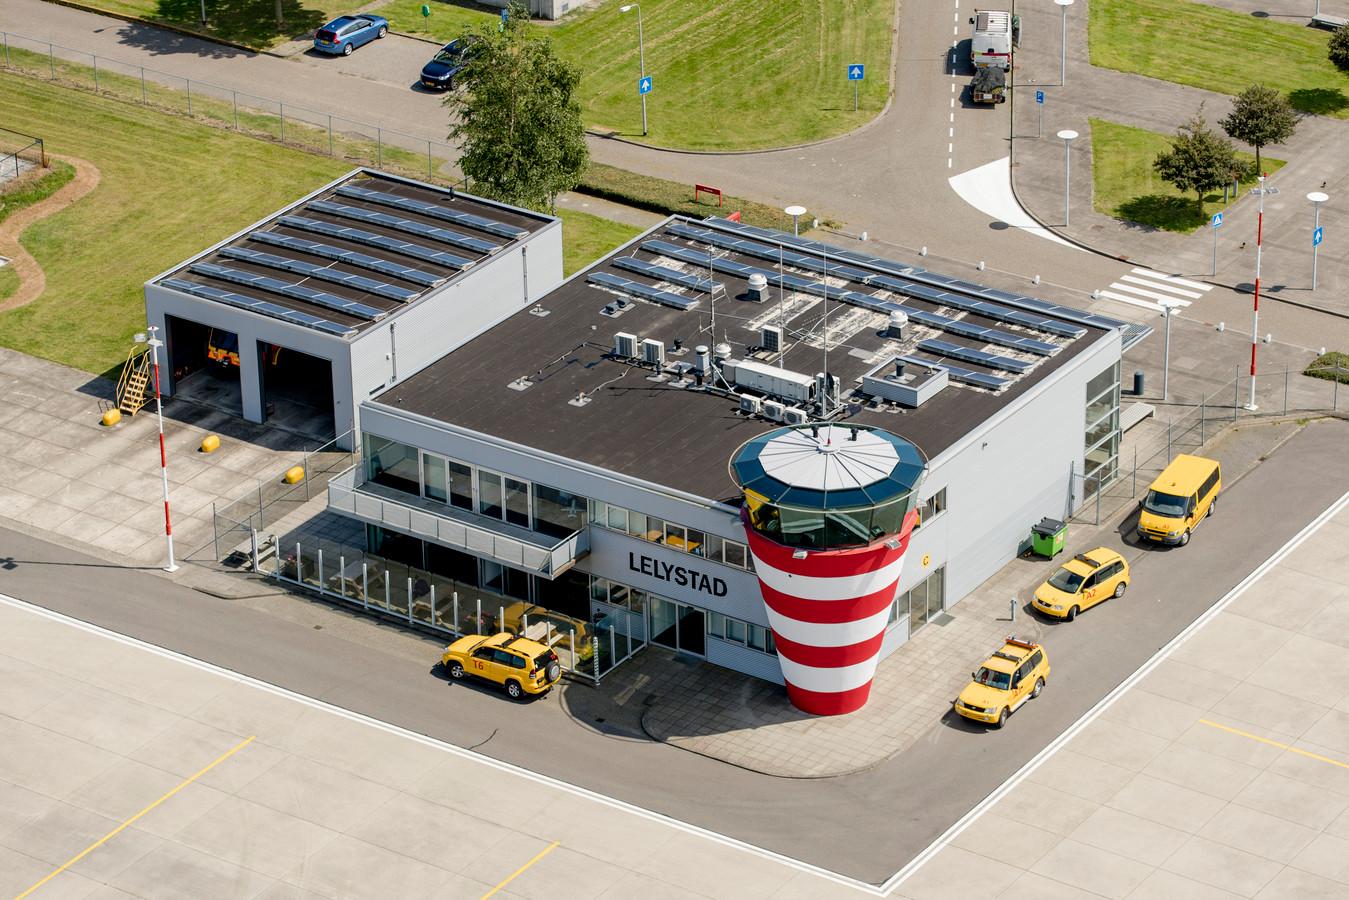 Lelystad Airport.